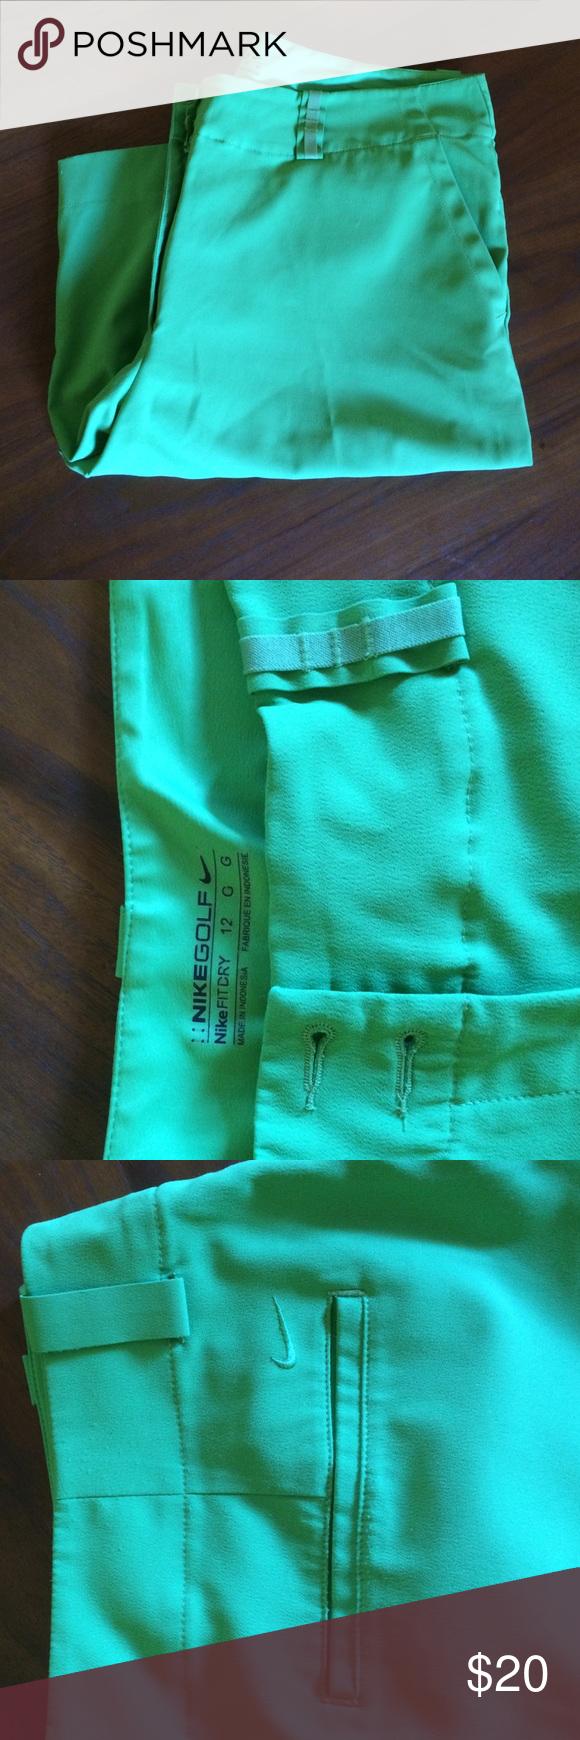 Green Nike golf shorts Spring green God shorts. Nike fit dry. Hardly worn. Nike Shorts Bermudas